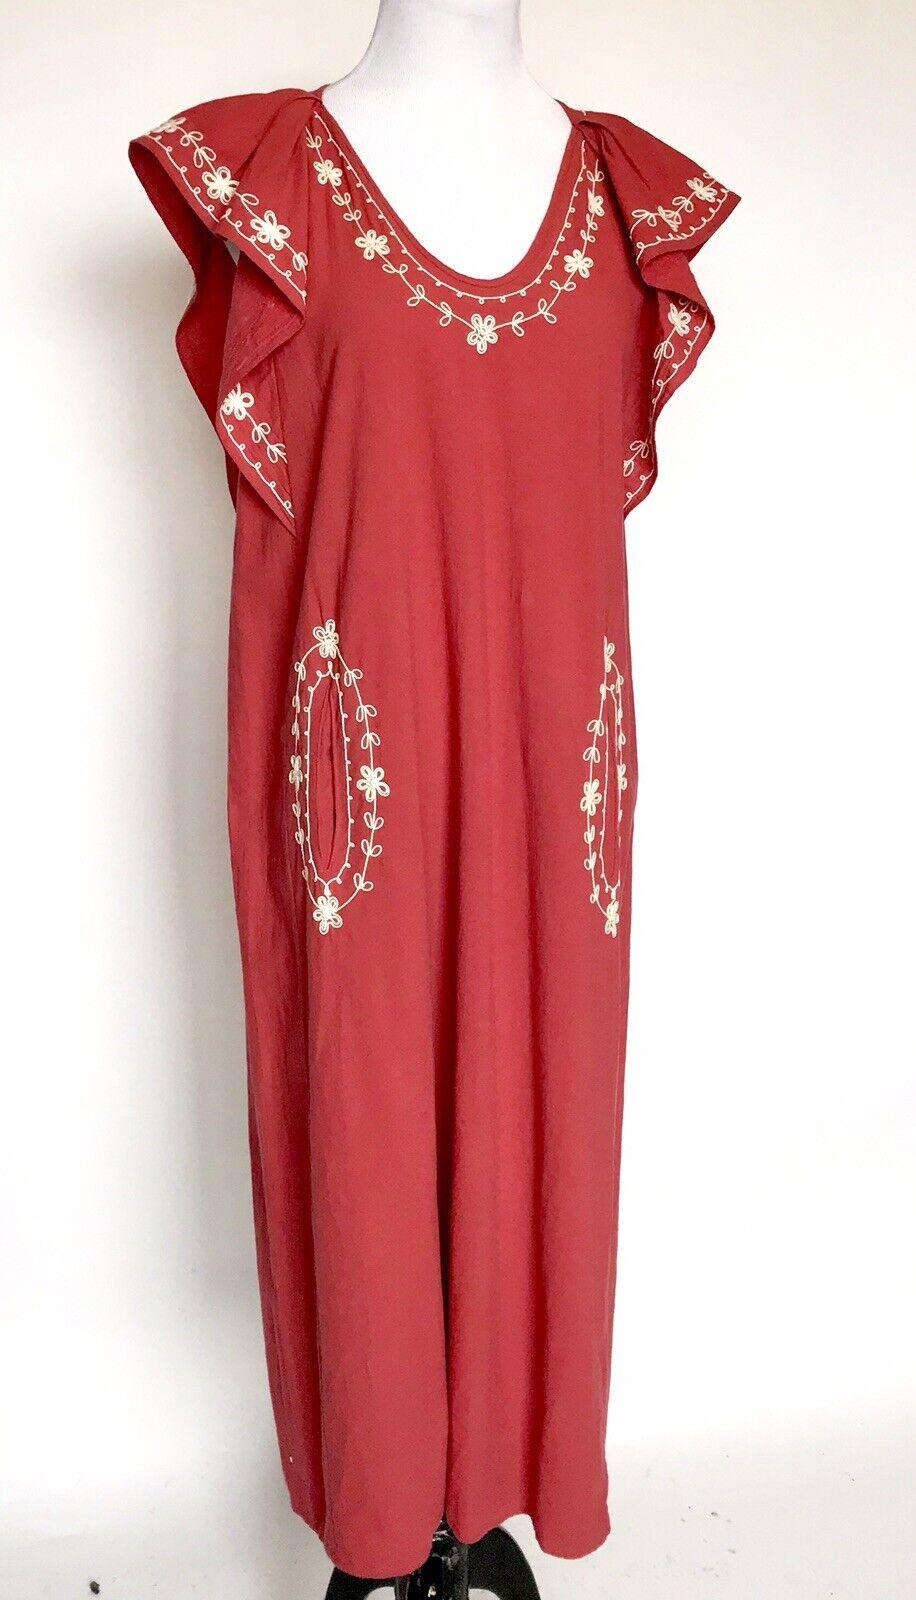 THE GREAT Saffron Vineyard Embroiderot Midi Dress Größe 1 S Retail  Price